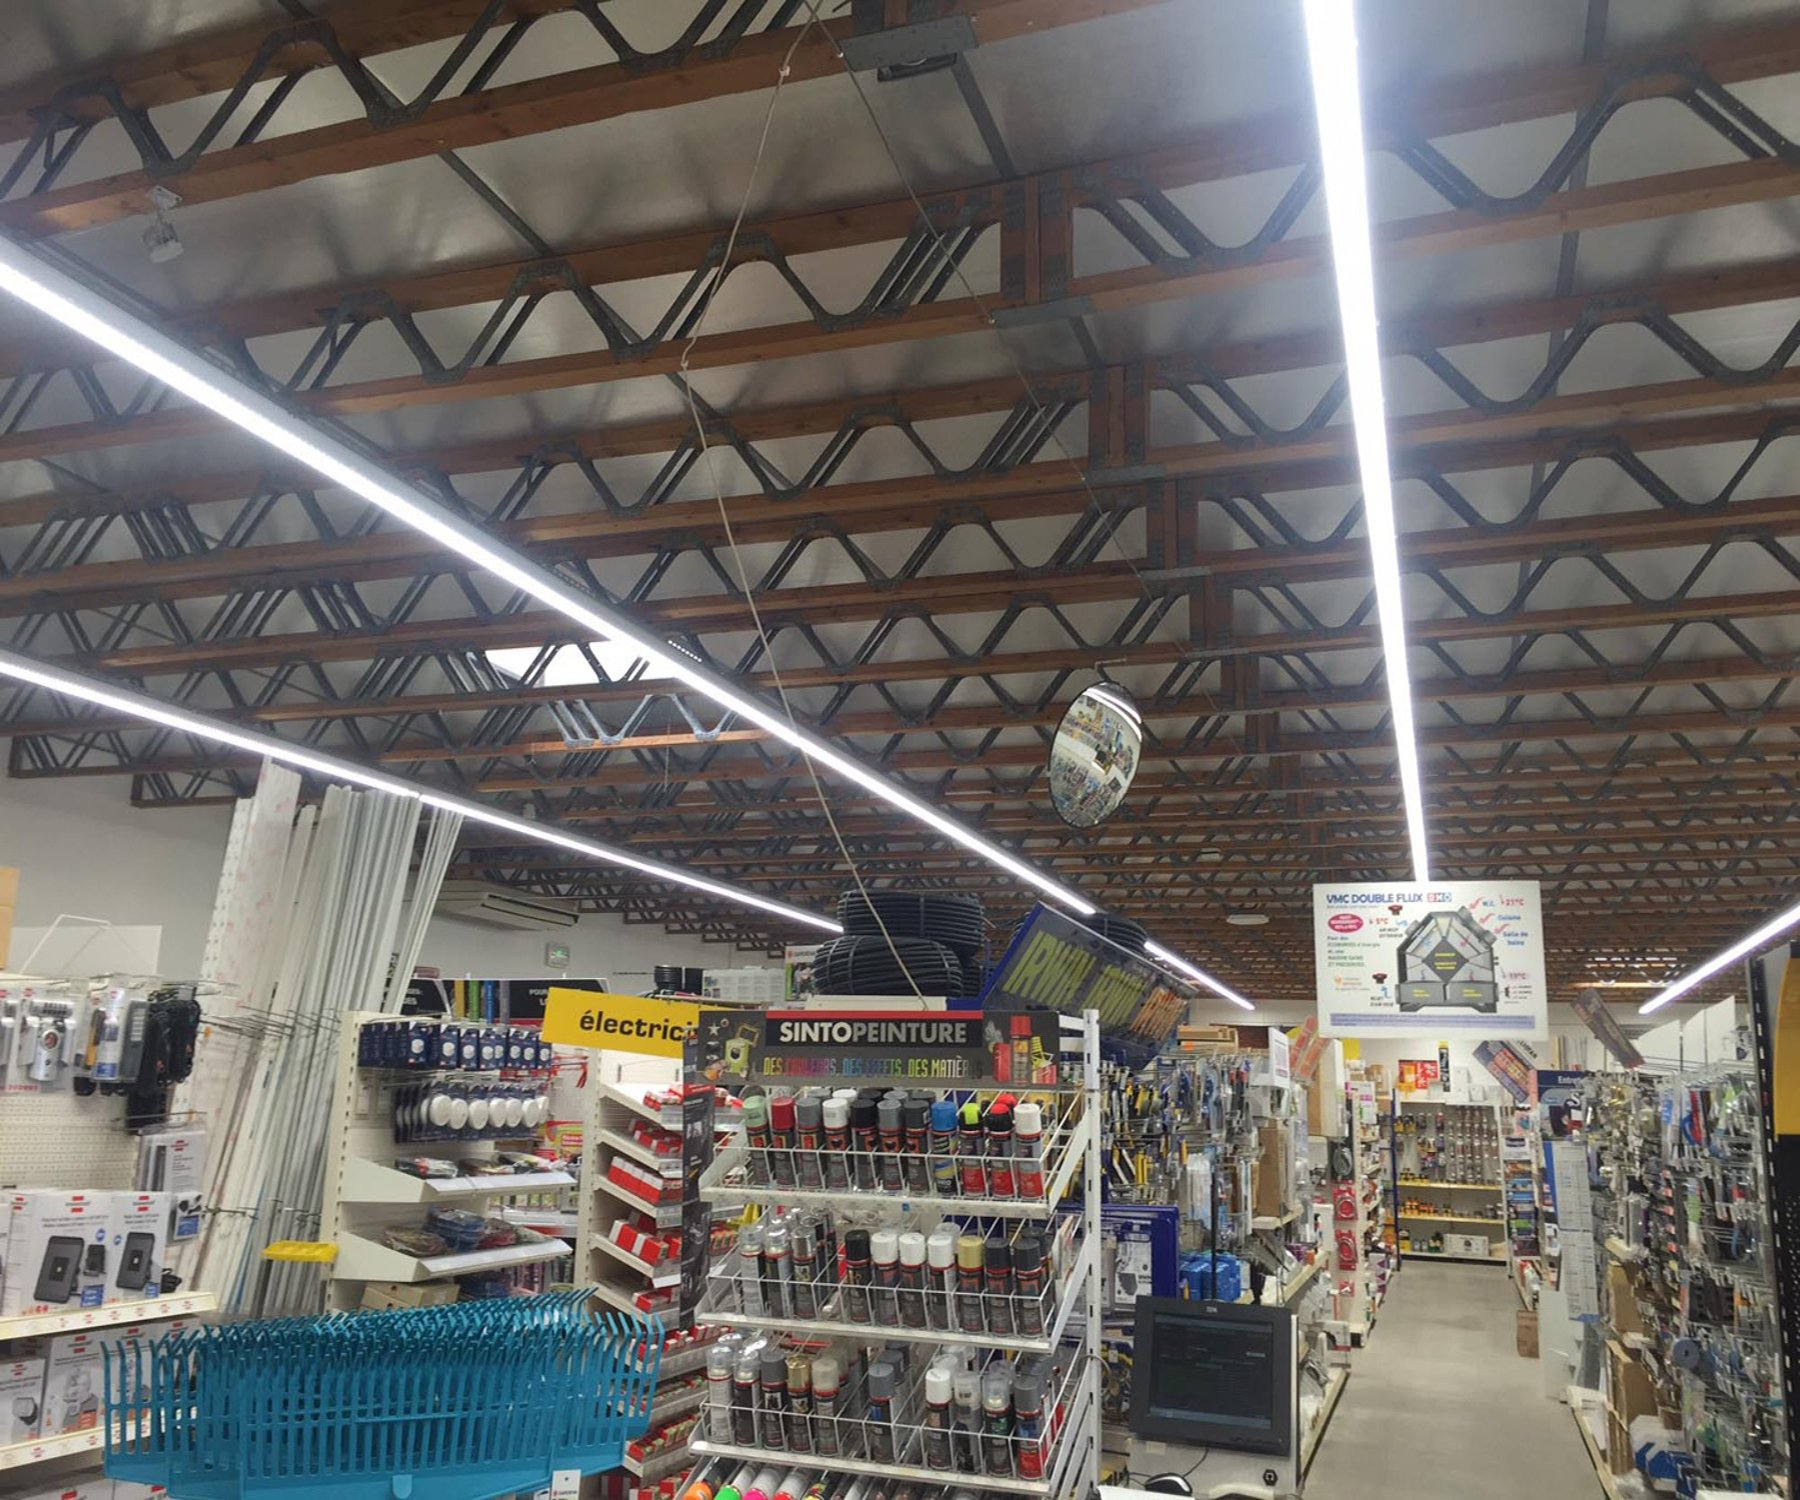 Linkable Led Shop Light: FaithSail 8FT LED Strip Lights Linkable Linear LED Shop